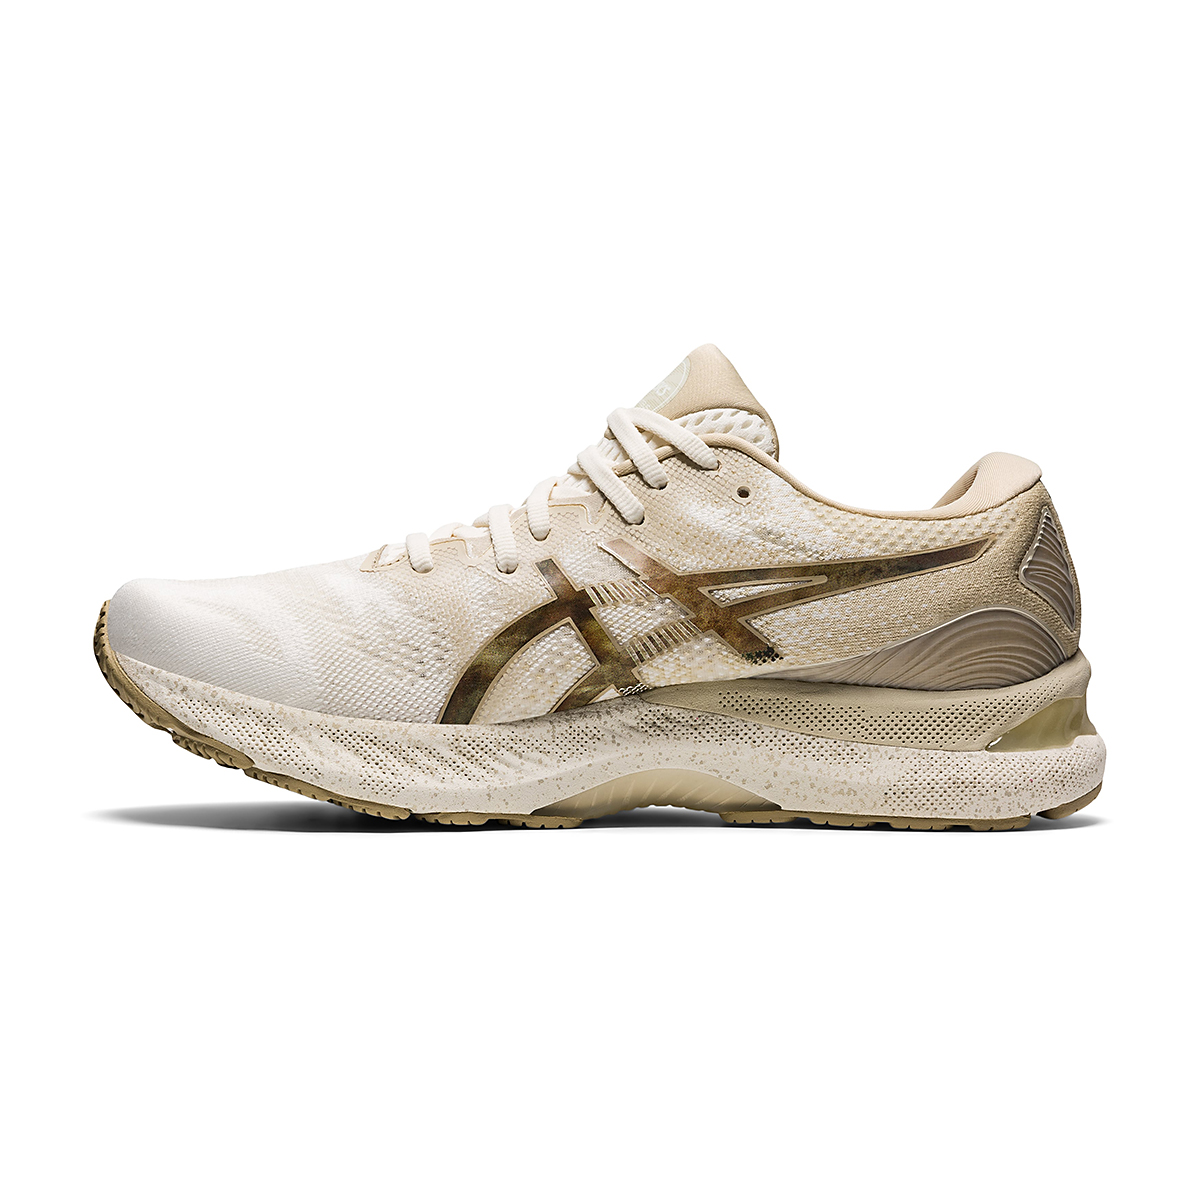 Men's Asics Gel-Nimbus 23 Earth Day Running Shoe - Color: Cream/Putty - Size: 7 - Width: Regular, Cream/Putty, large, image 2